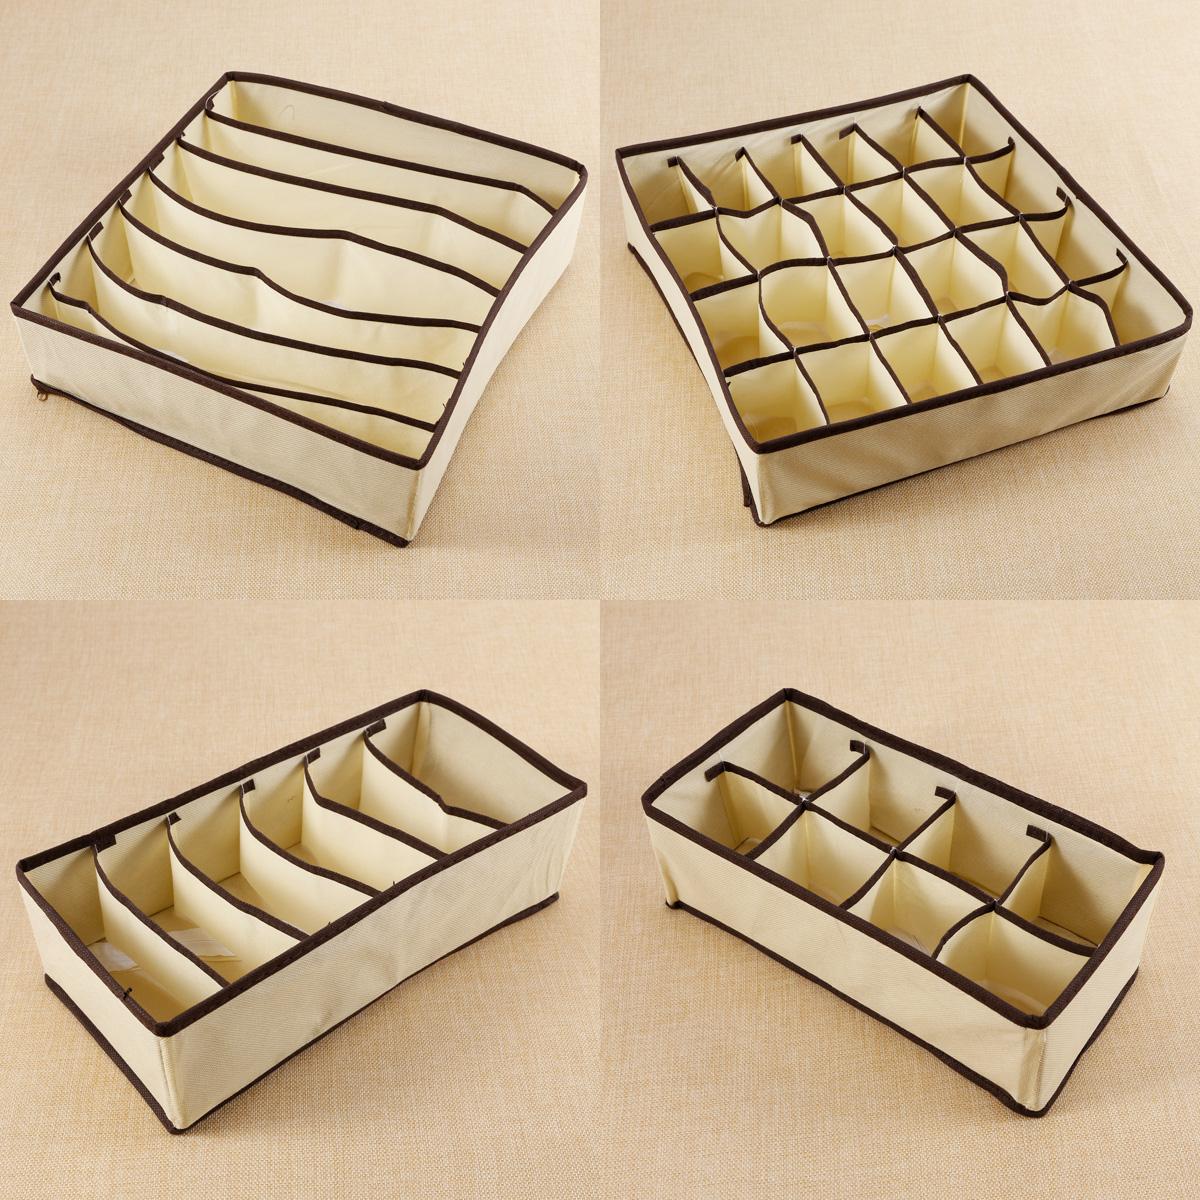 4 PCS Set Foldable Organizer Storage Box For Bra Ties ...